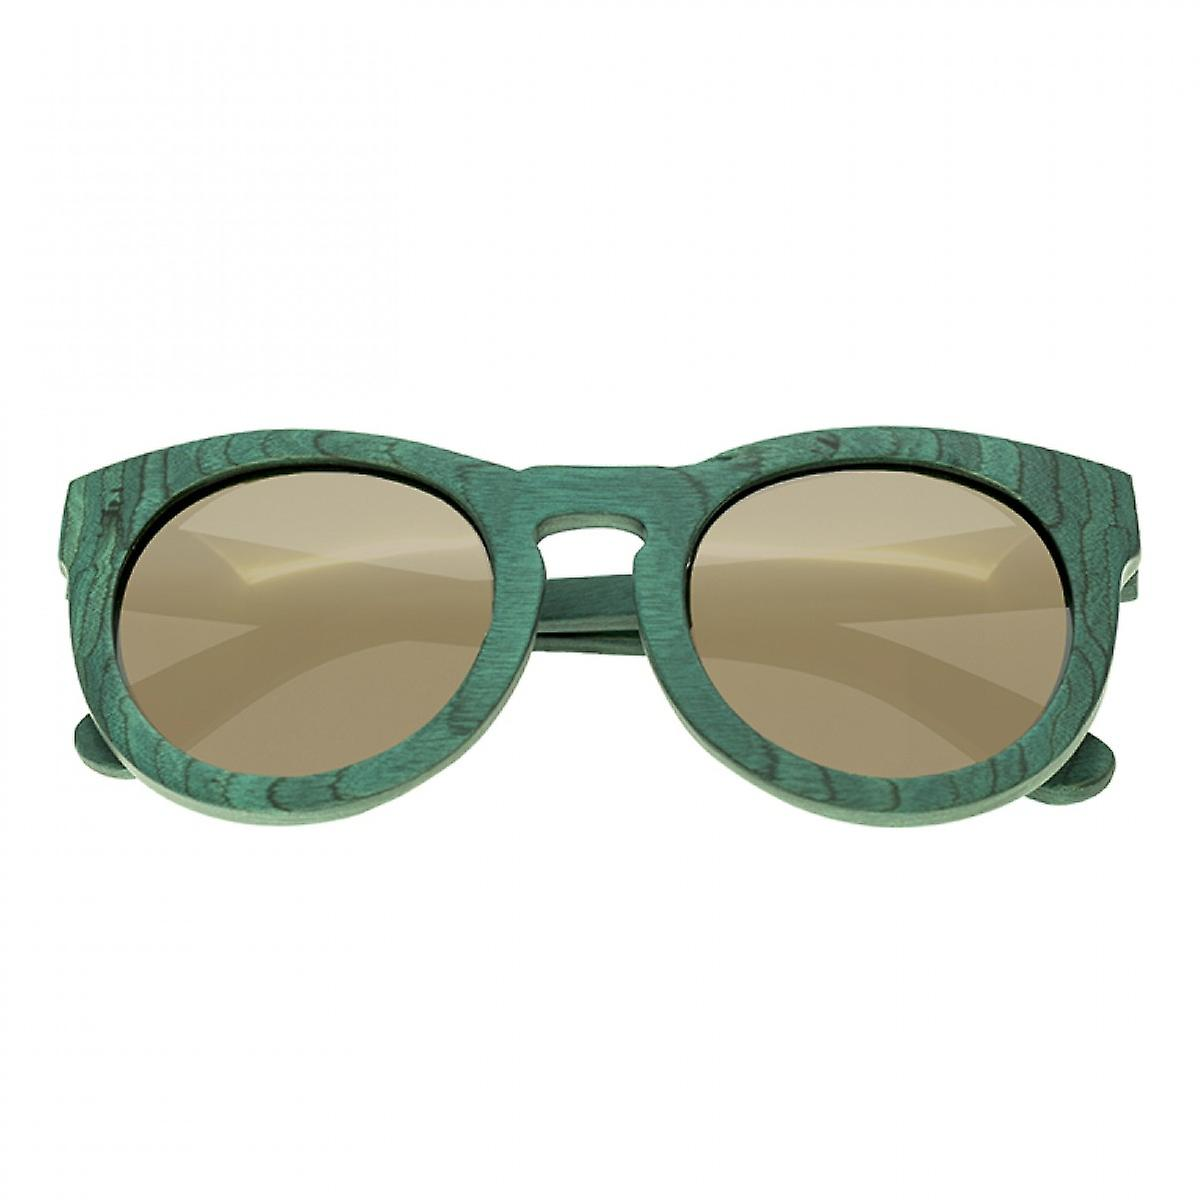 Spectrum Malloy Wood Polarized Sunglasses - Teal/Gold